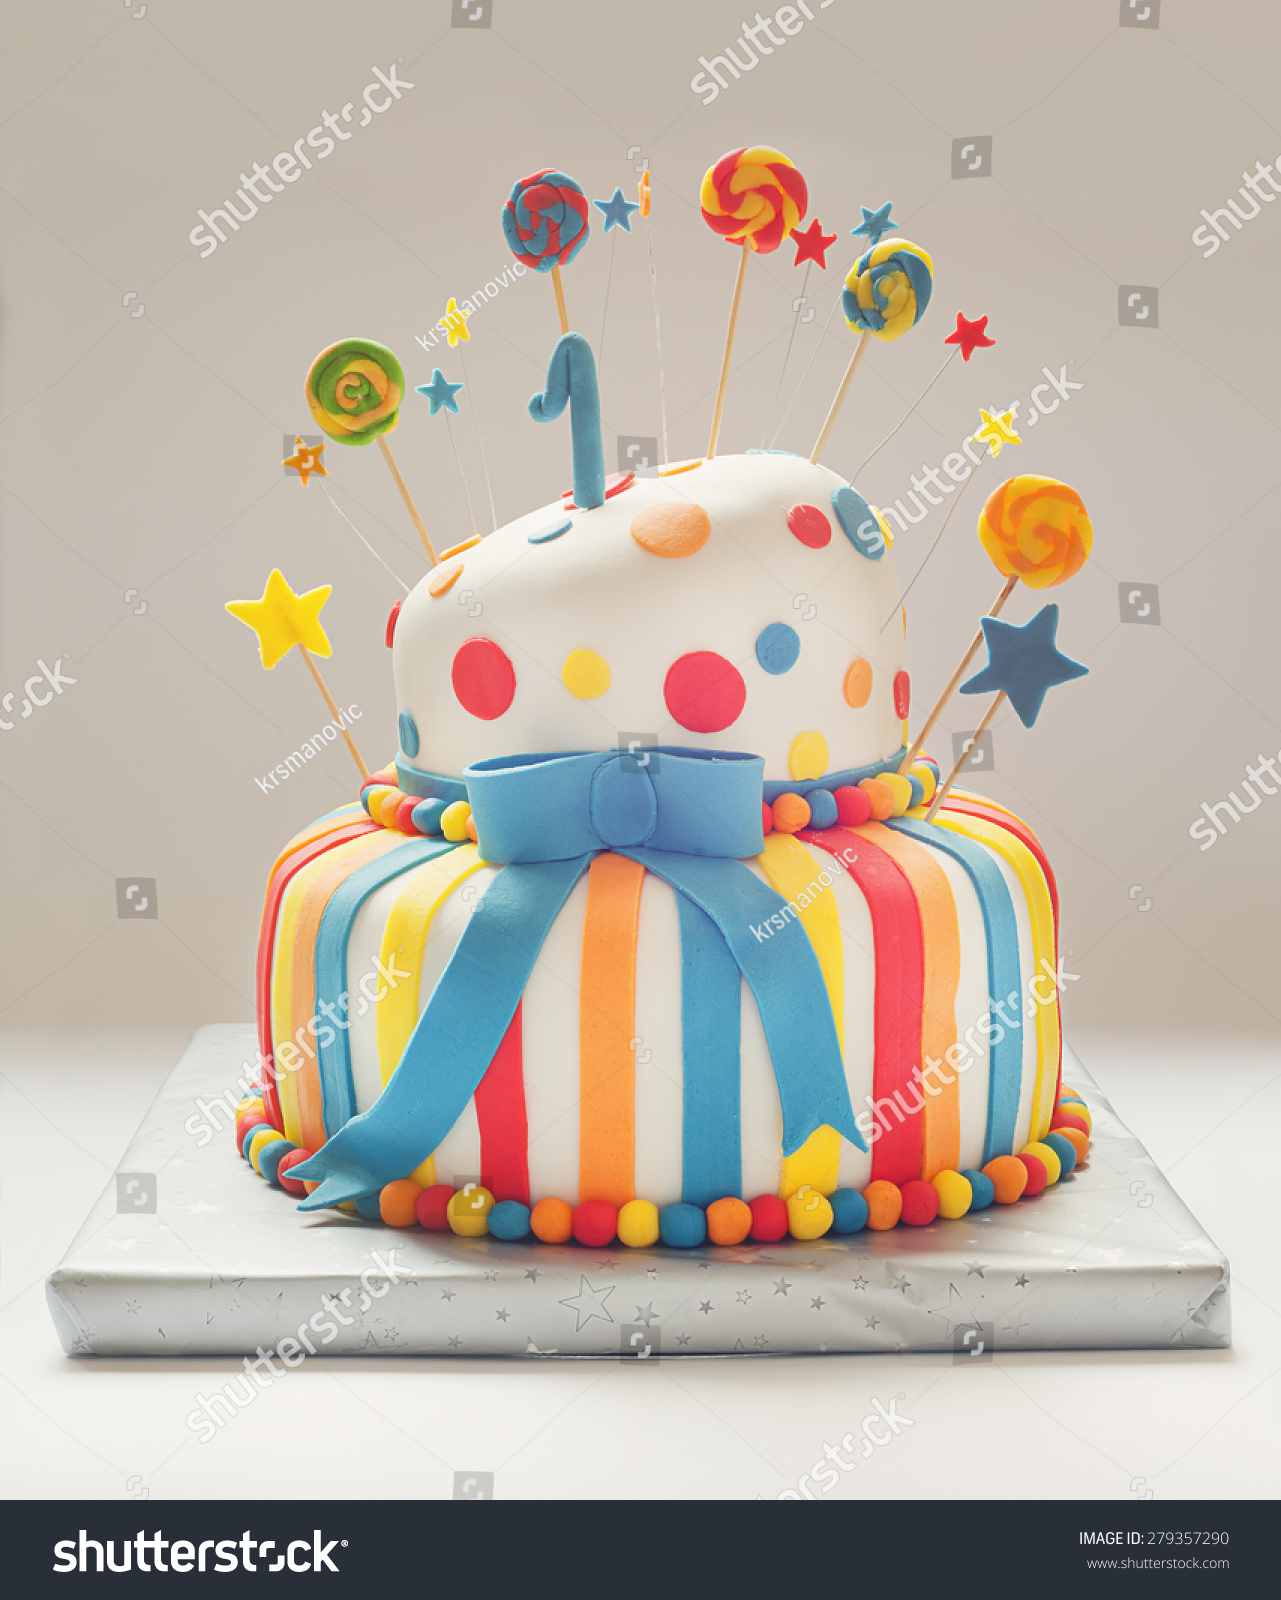 Phenomenal Funny Birthday Cake Number One On Stock Photo Edit Now 279357290 Funny Birthday Cards Online Drosicarndamsfinfo